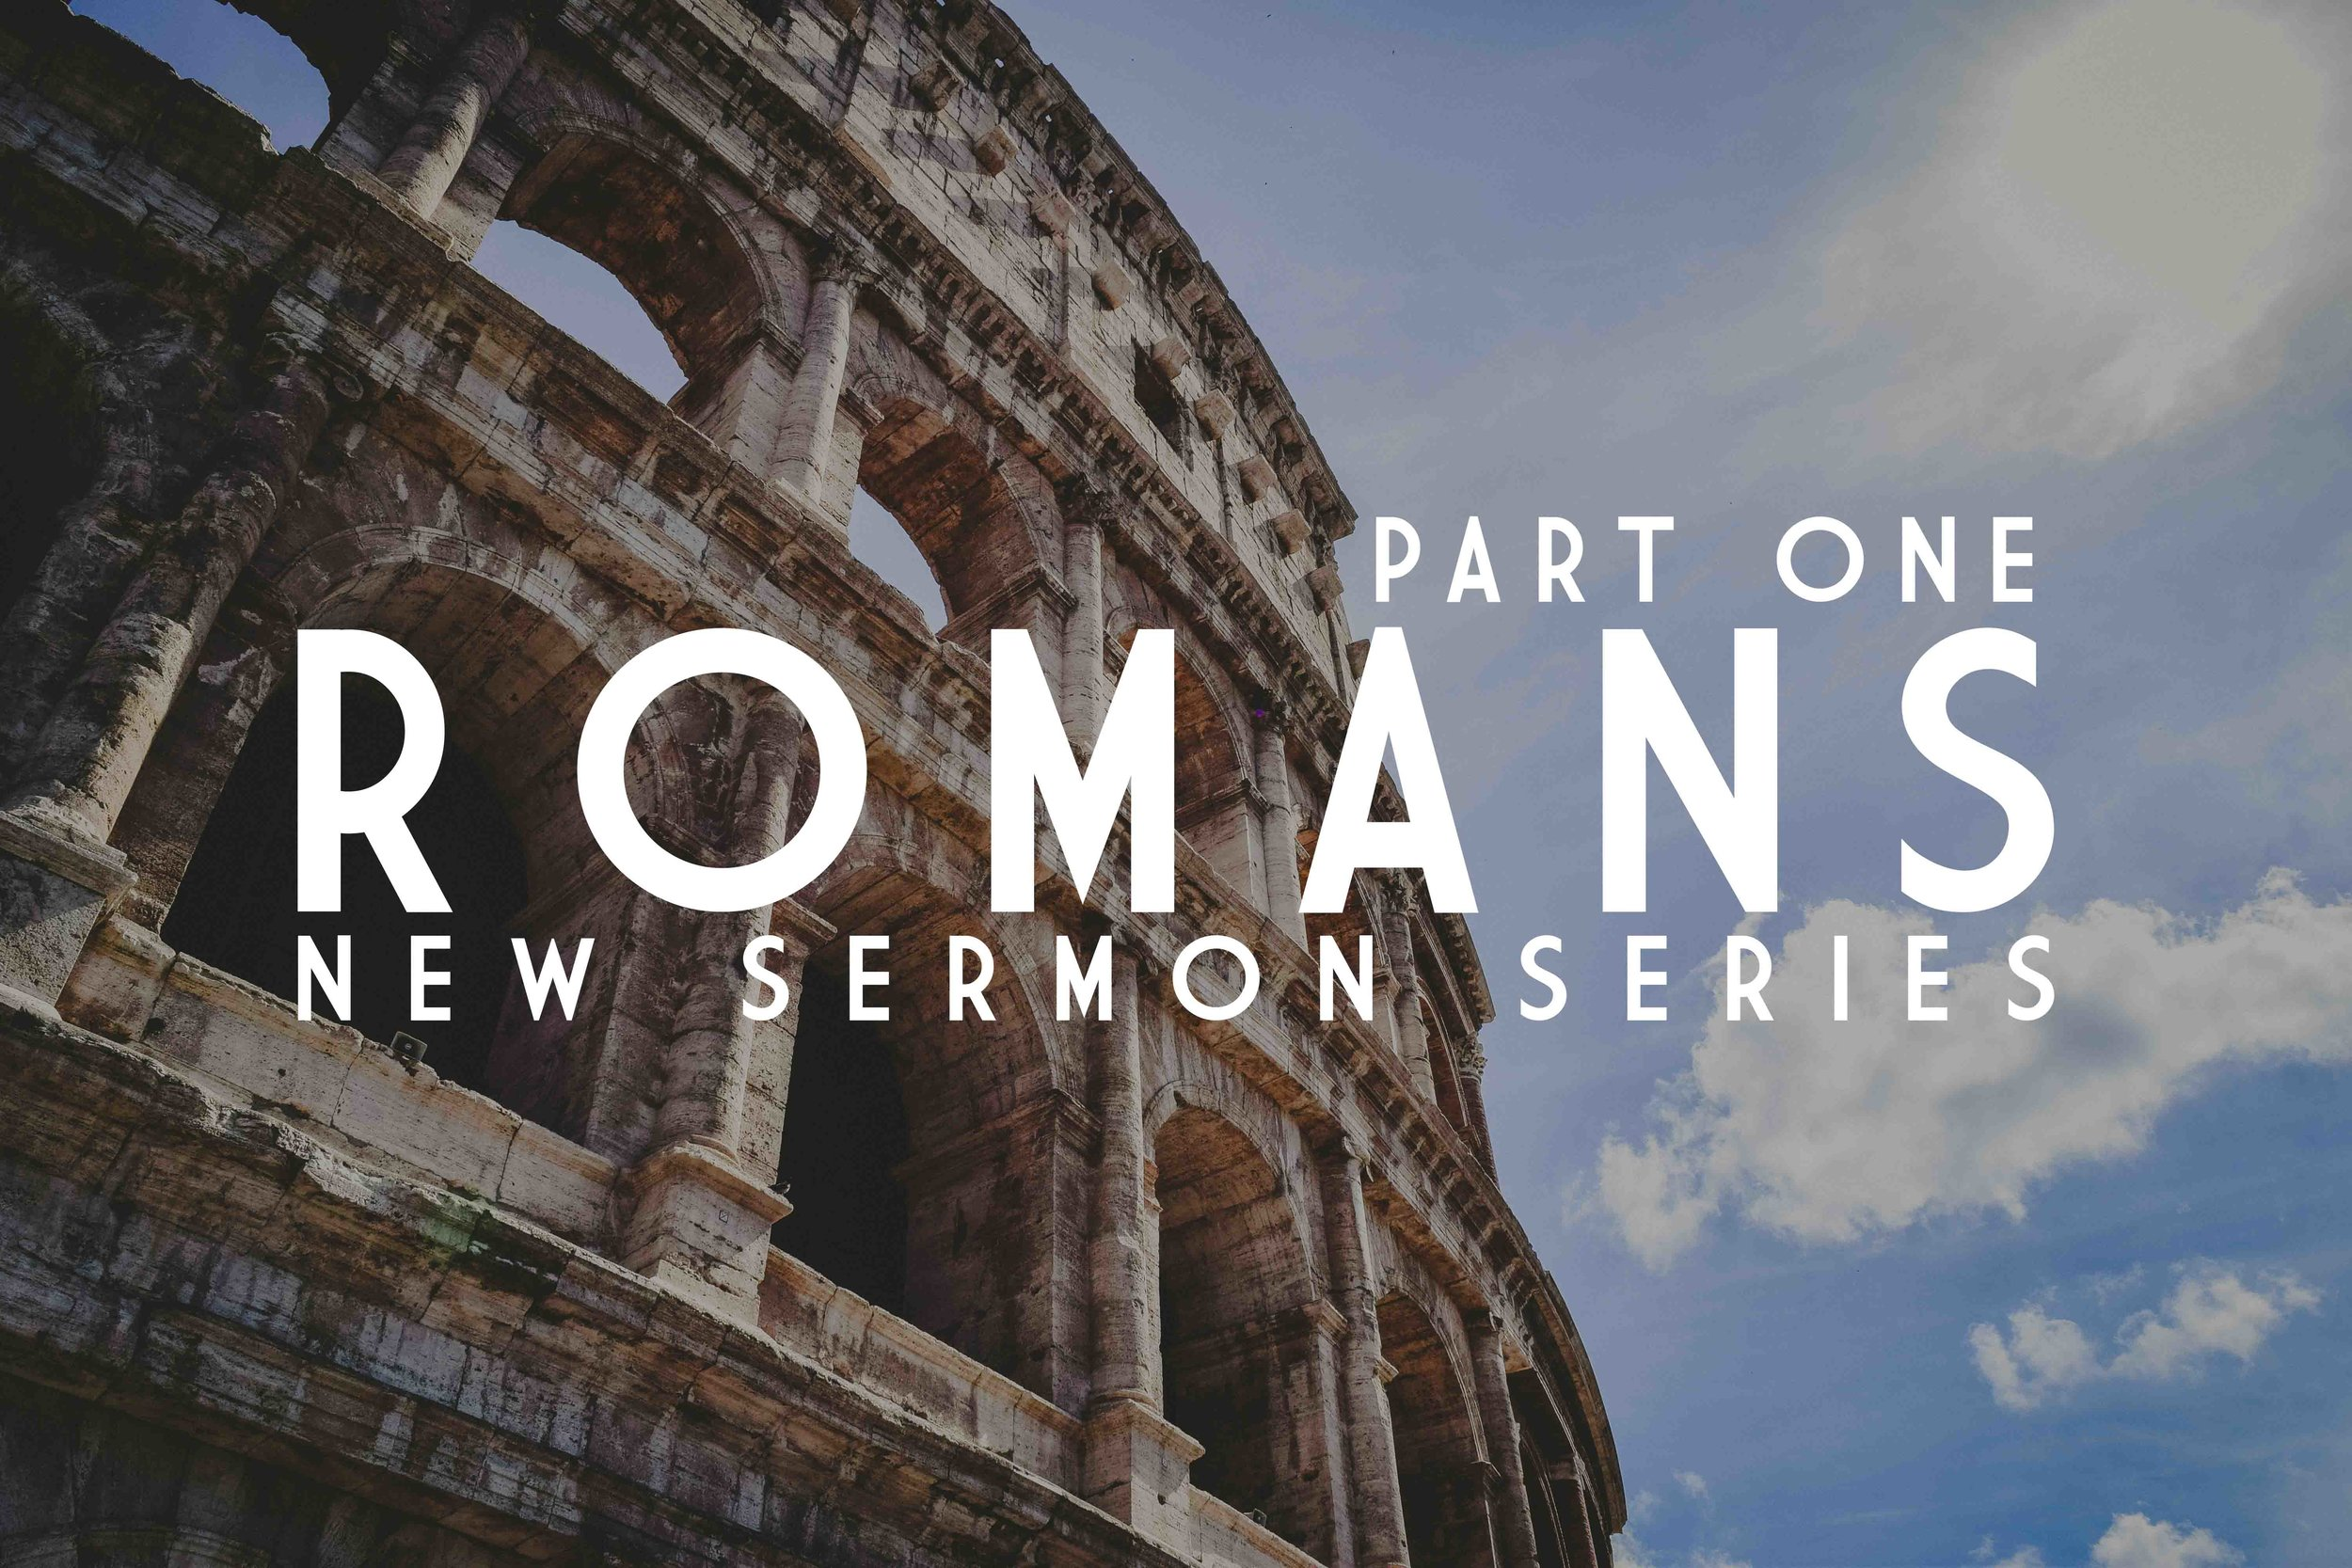 ROMANS-SERIES-Part-1.jpg